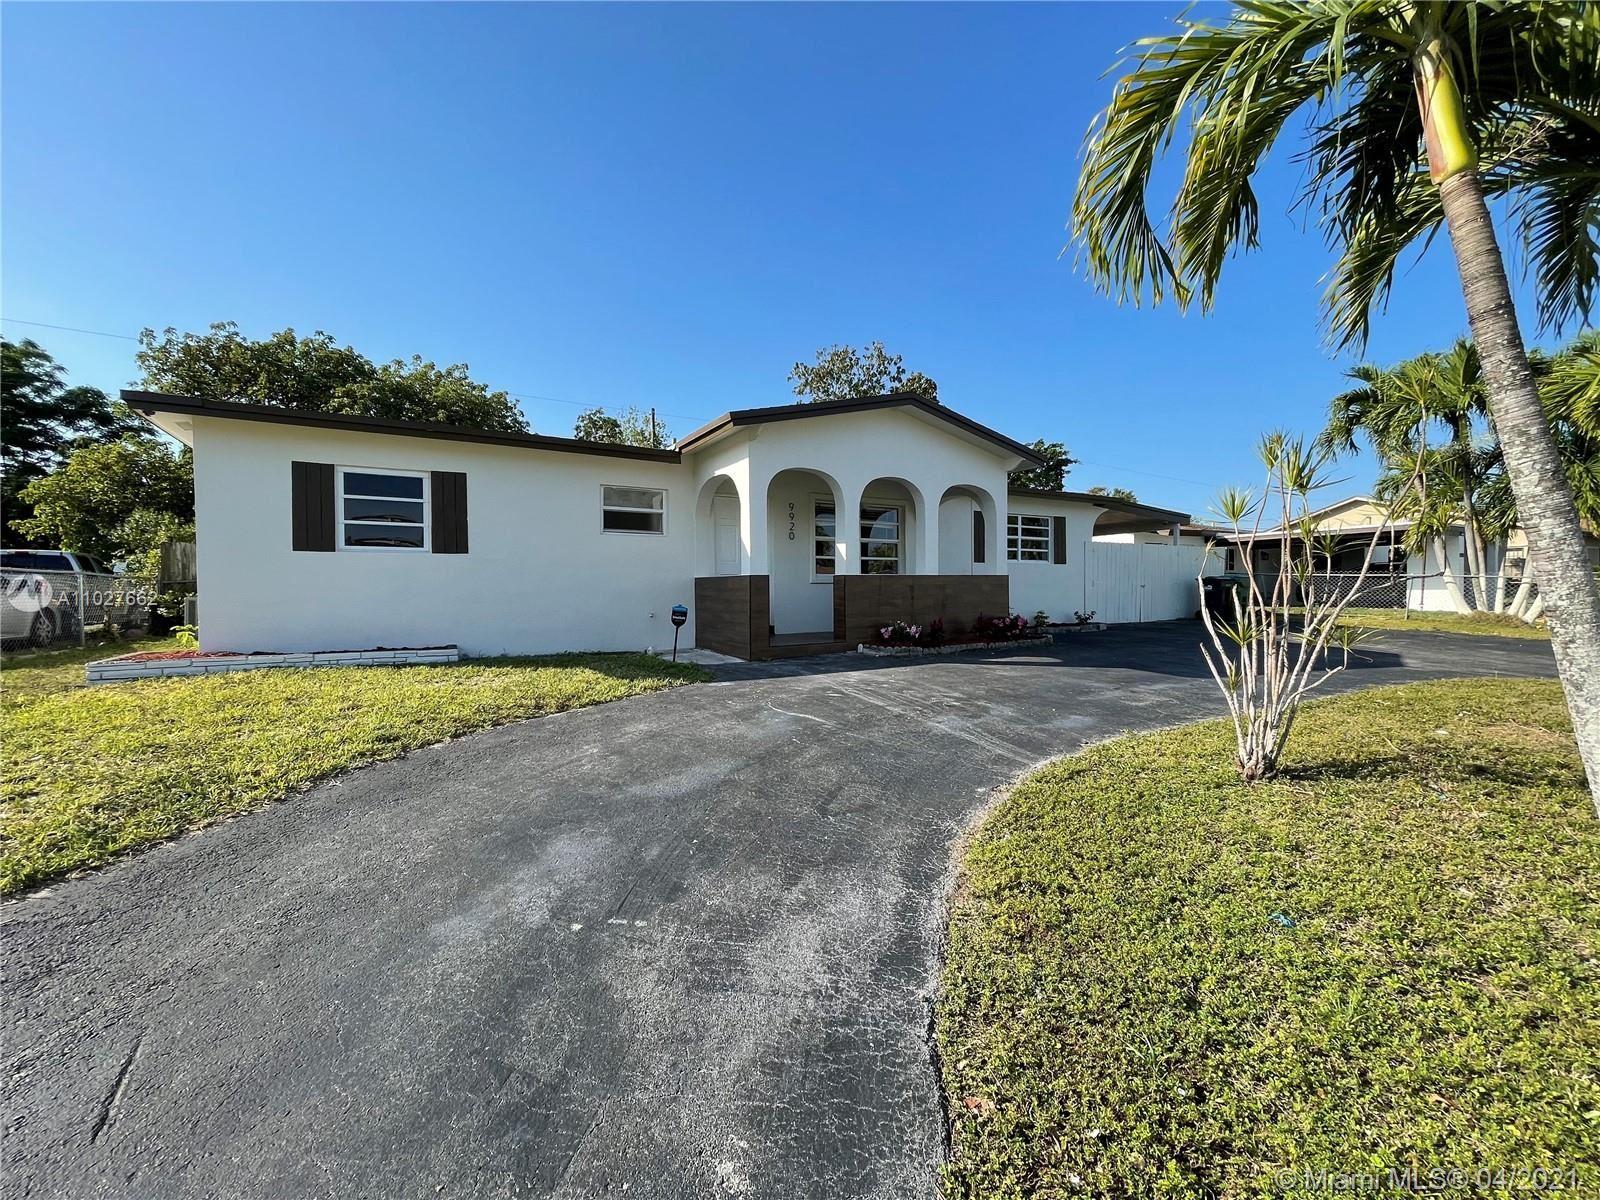 9920 Jamaica Dr, Cutler Bay, FL 33189 - #: A11027662